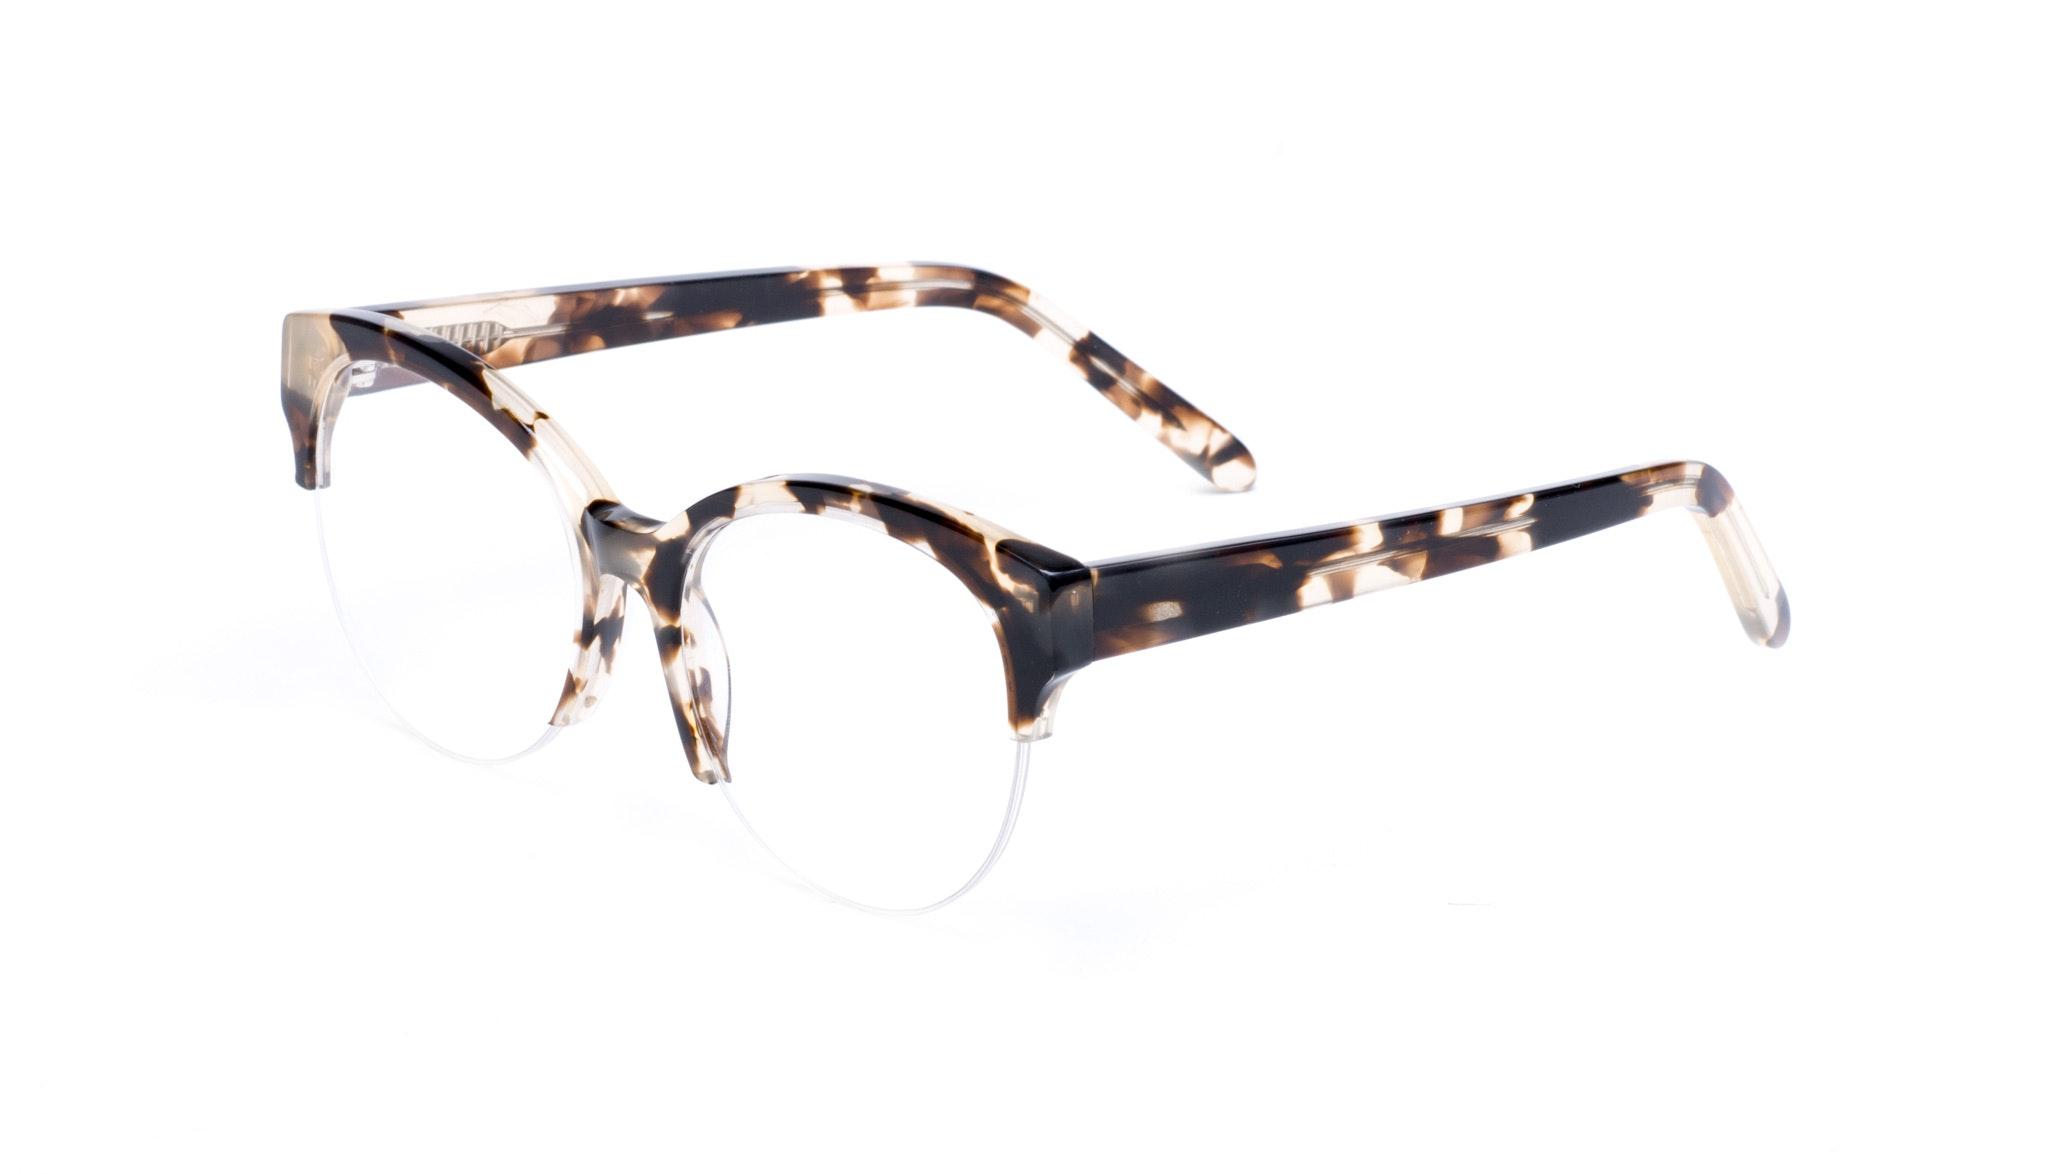 Affordable Fashion Glasses Cat Eye Round Semi-Rimless Eyeglasses Women Eclipse Light Mocha Tortoise II Tilt